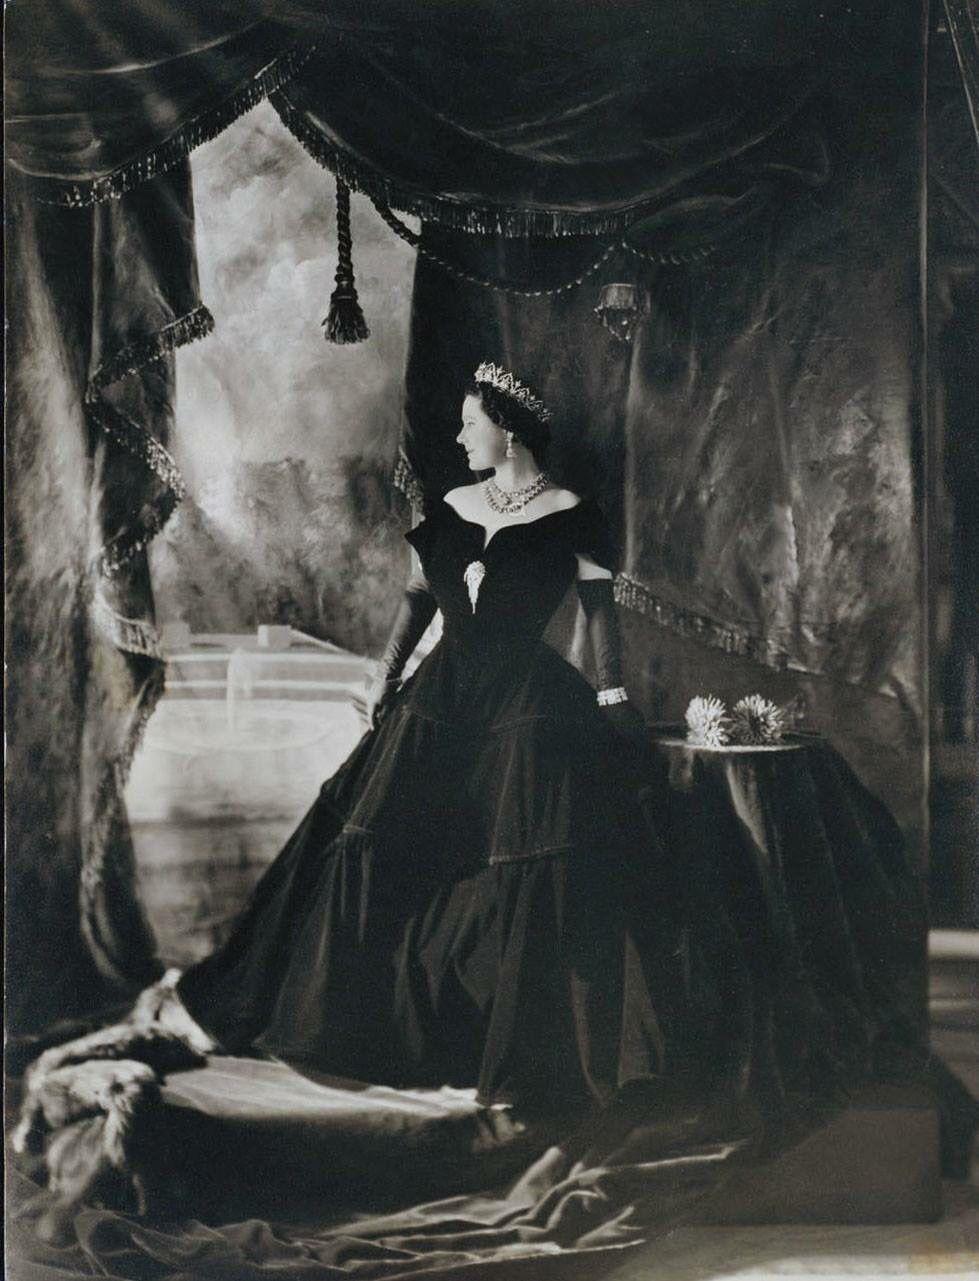 The Queen Mother (With images) Queen mother, Queen of